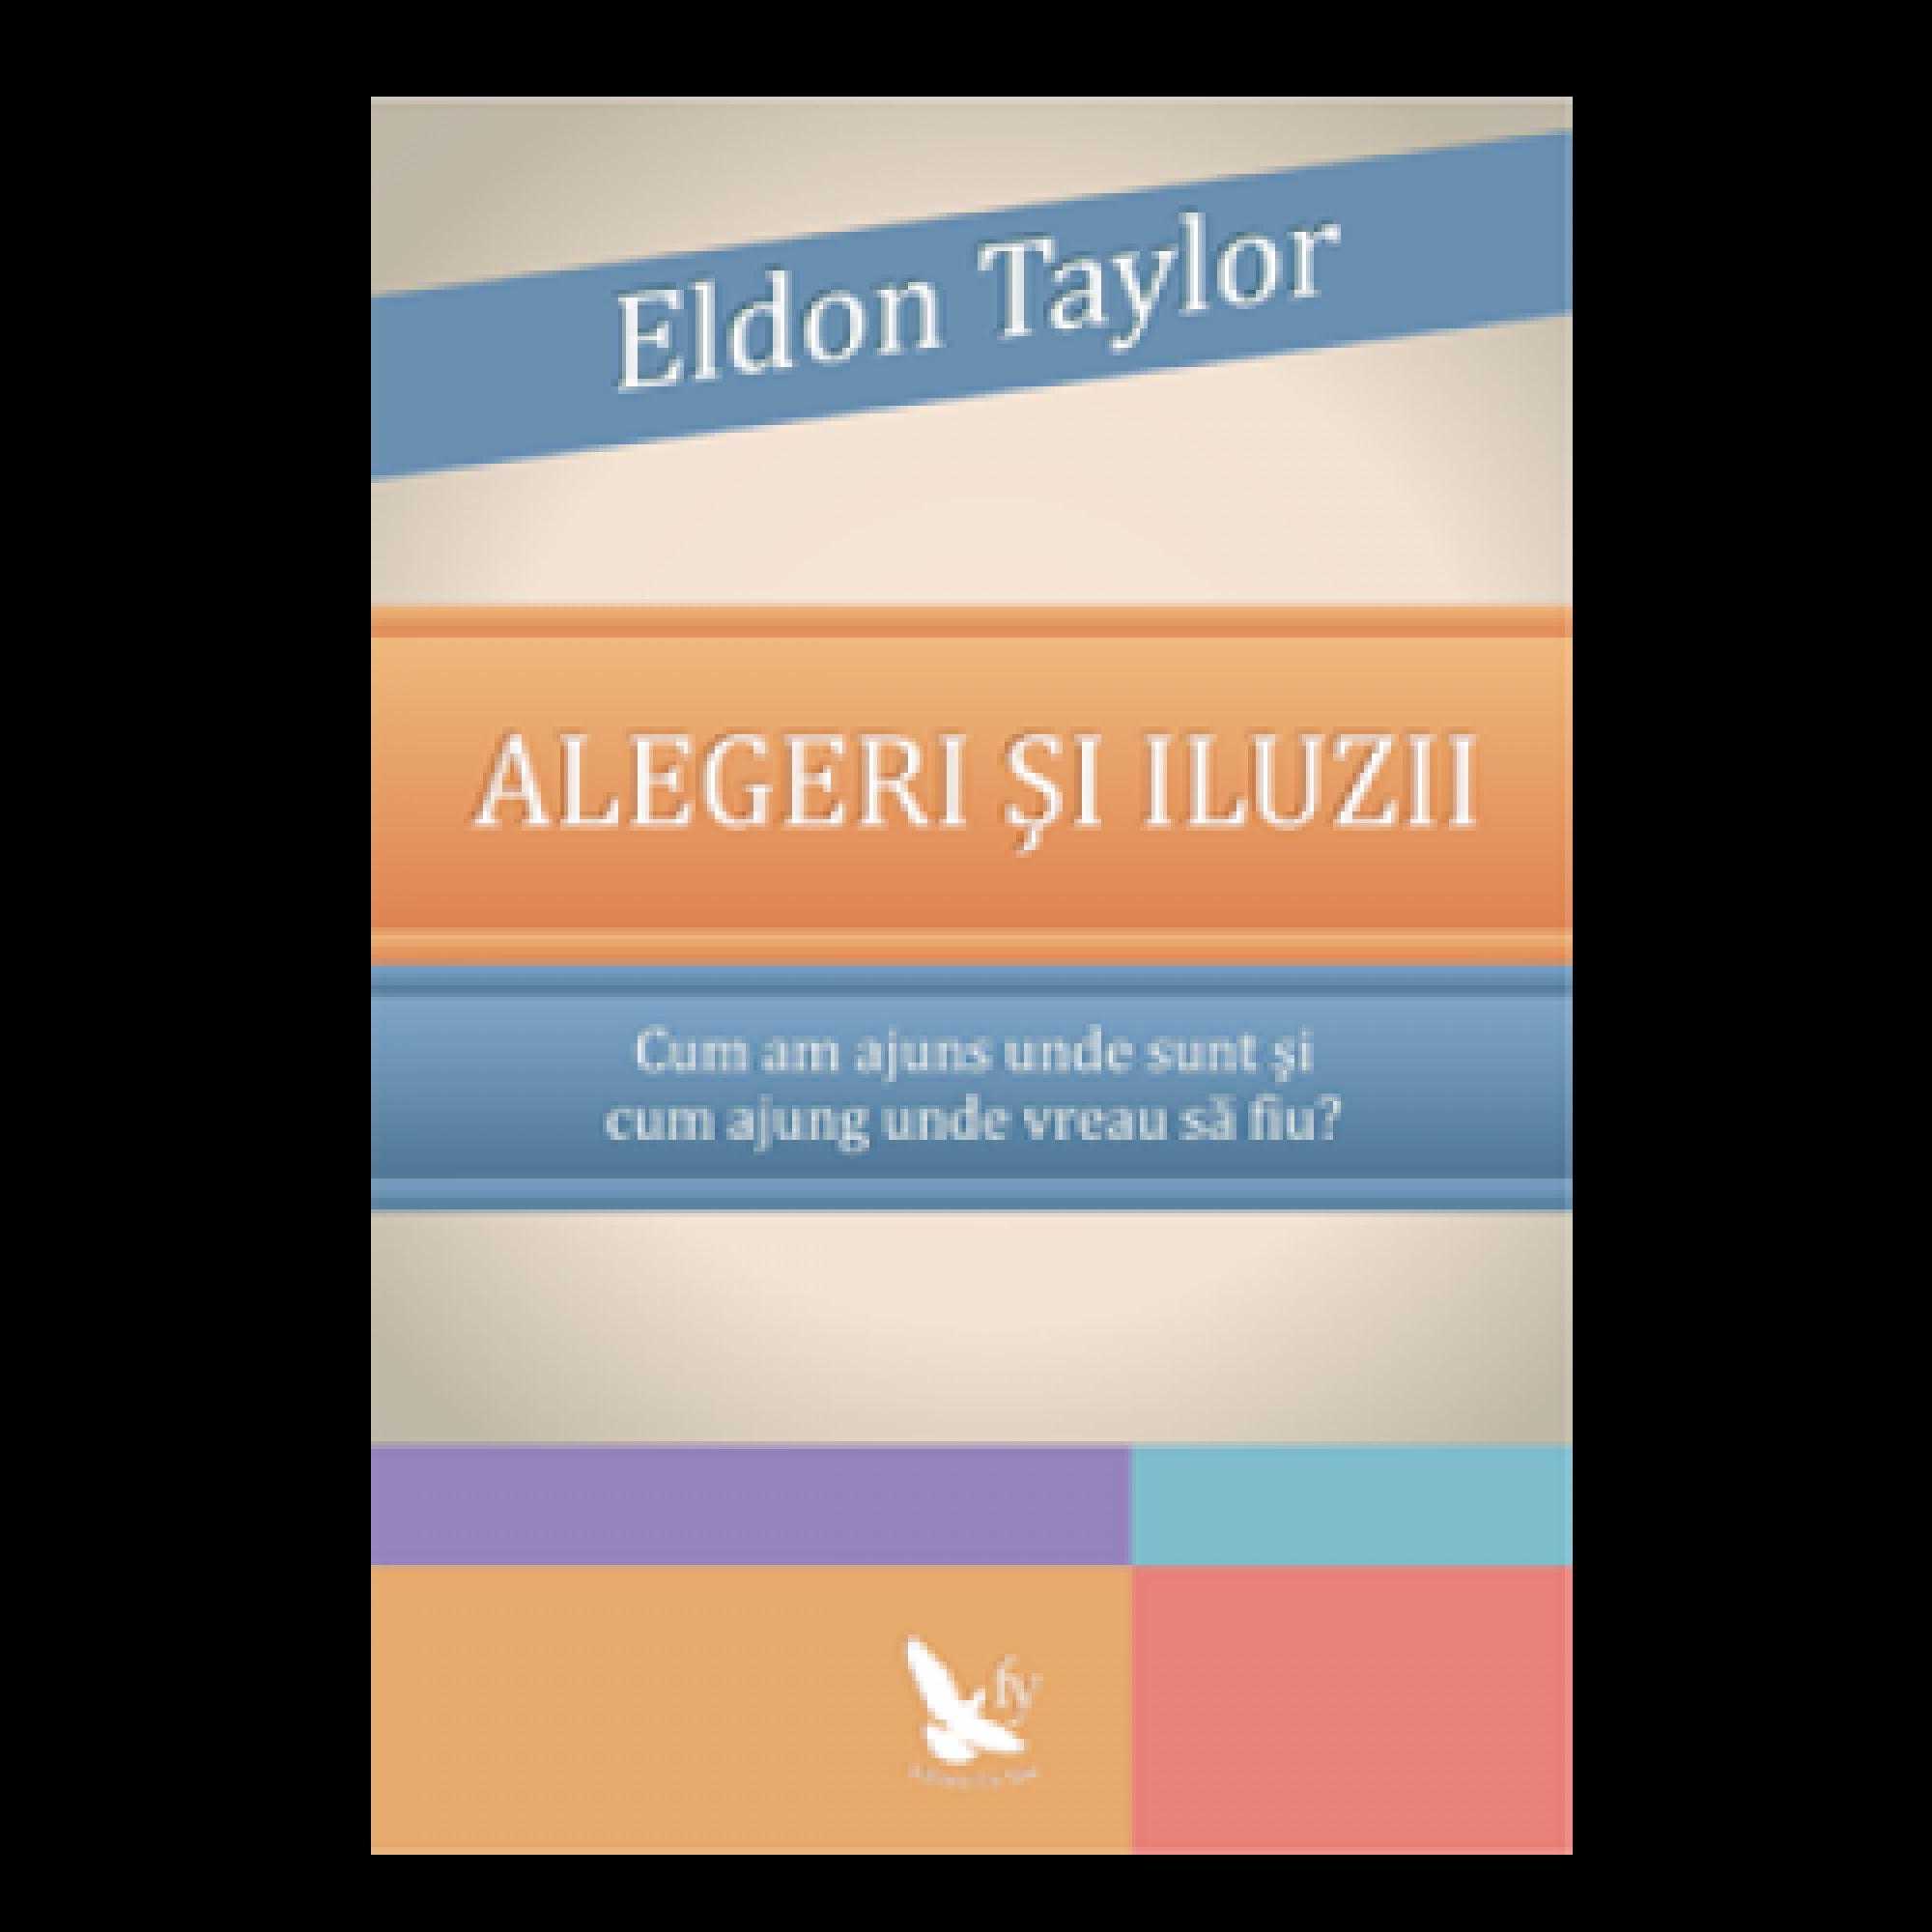 Alegeri și iluzii; Eldon Taylor